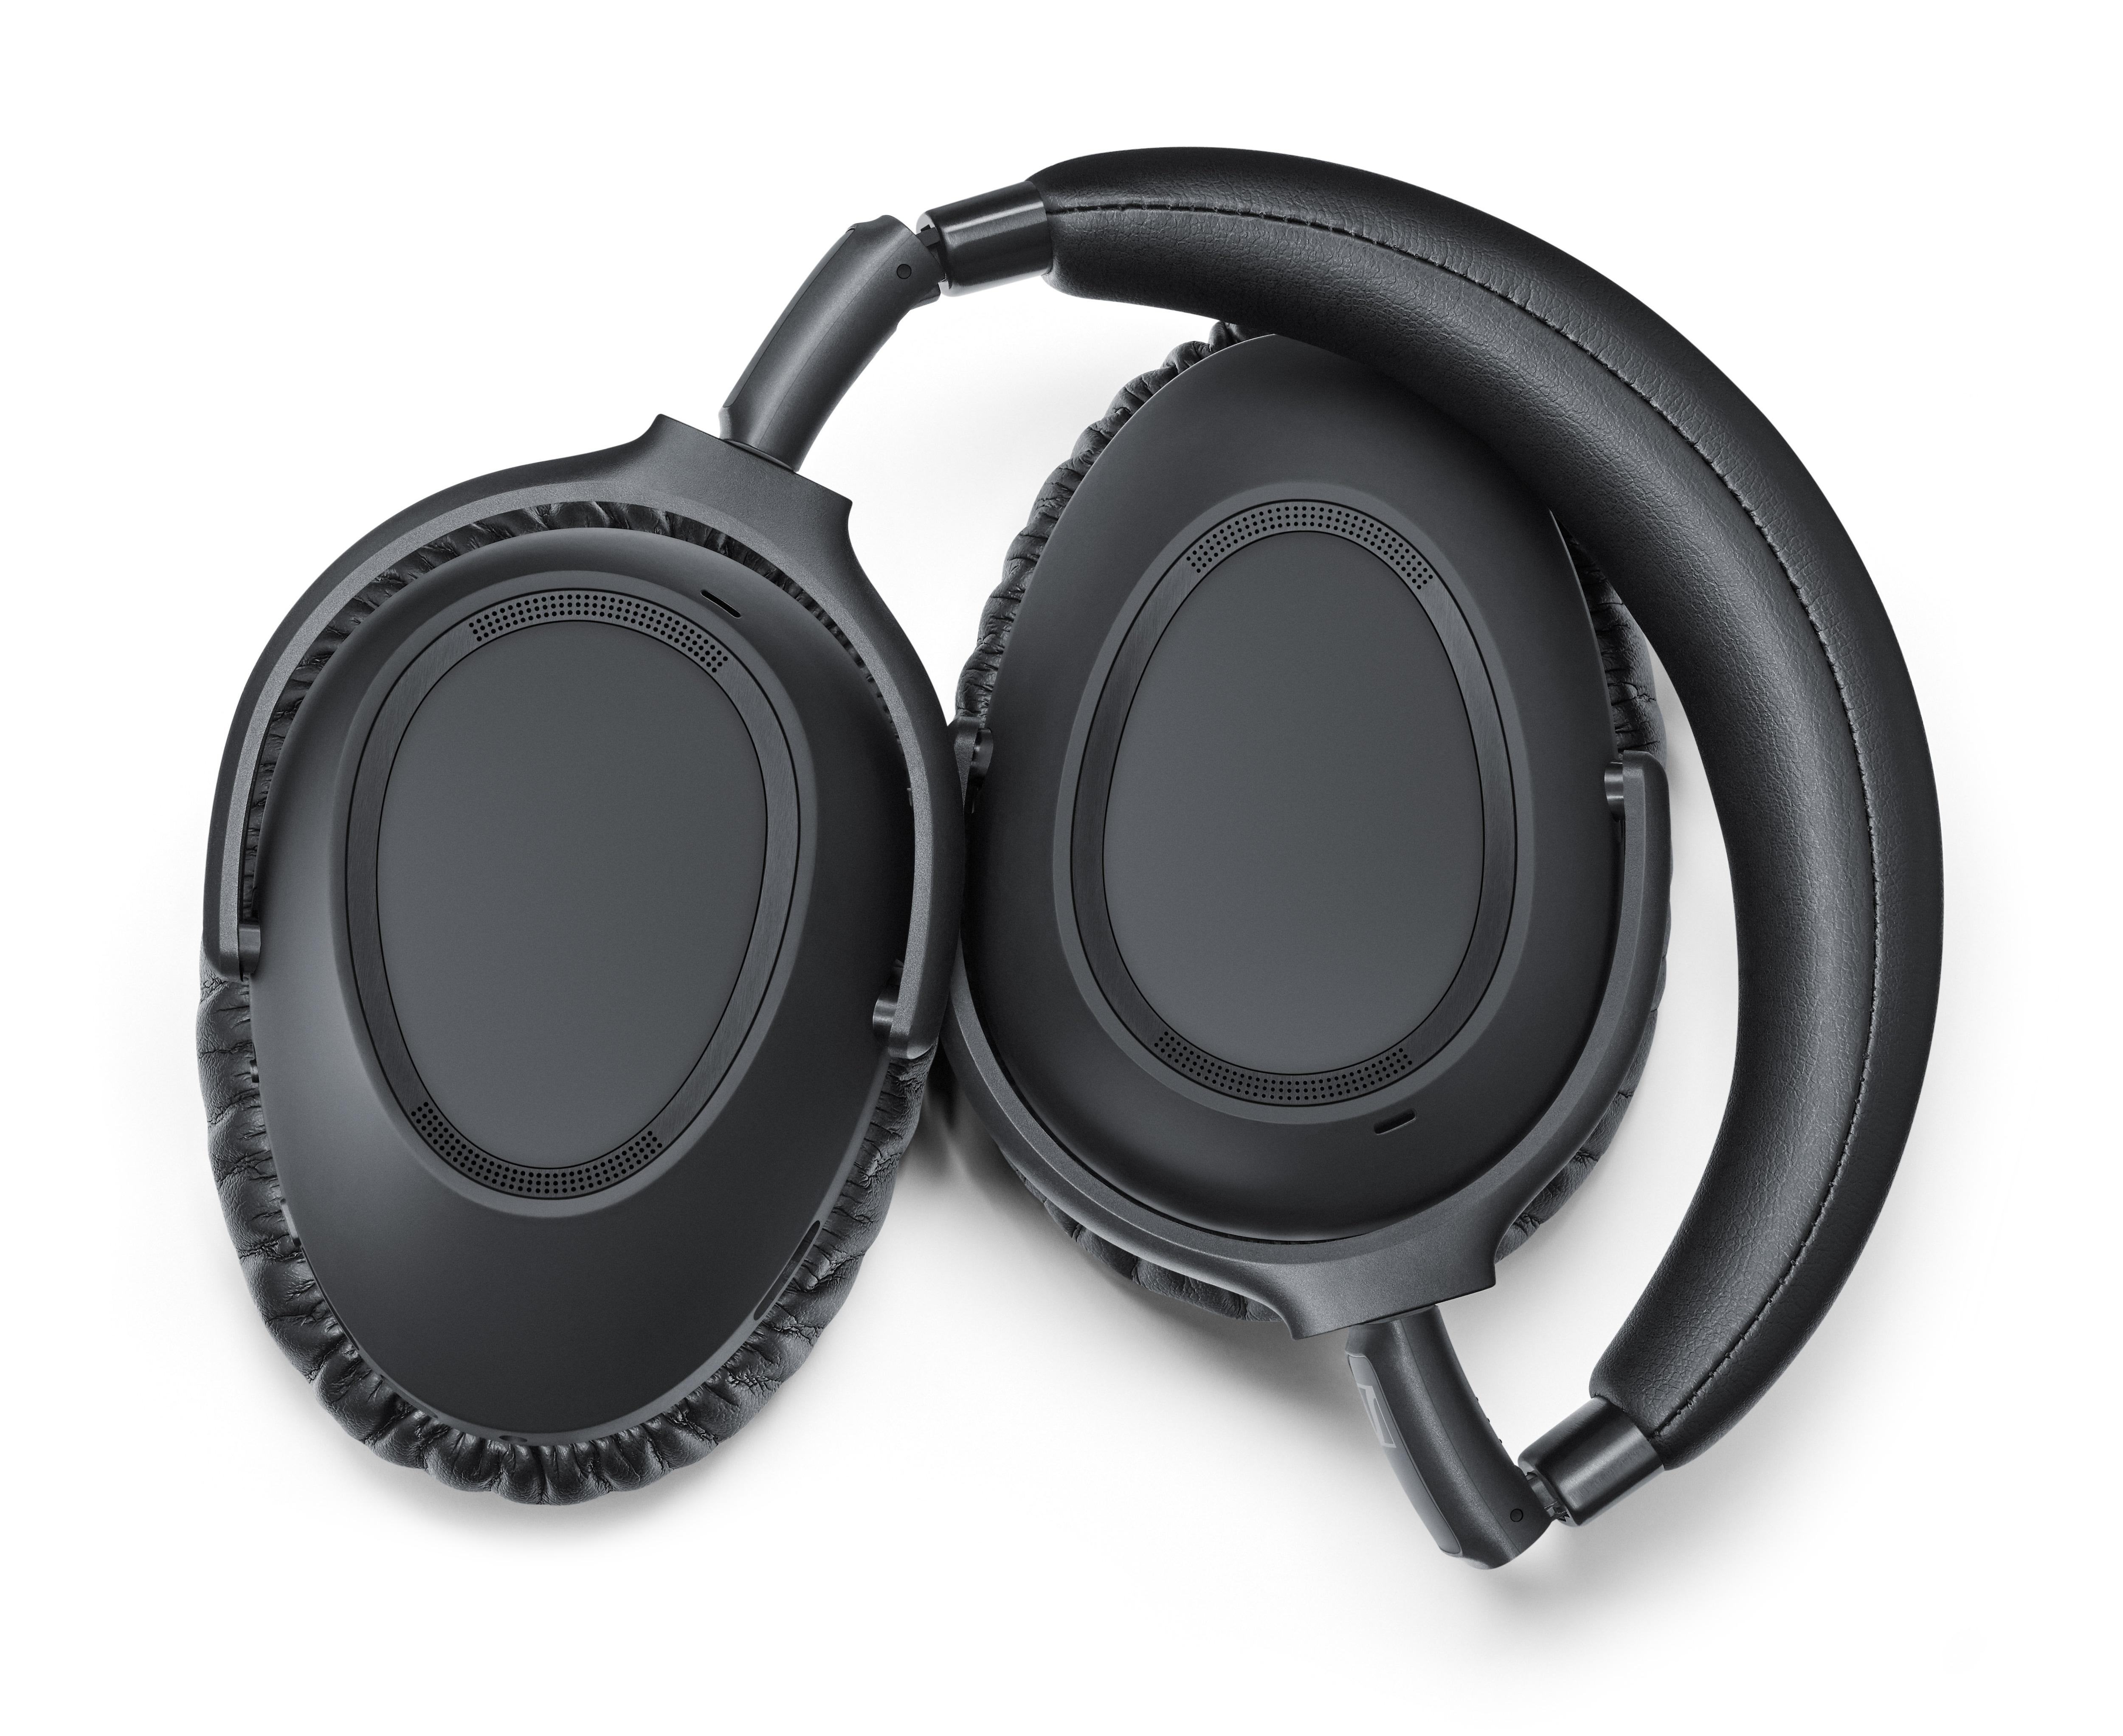 Sennheiser_PXC550-II_Wireless (9)